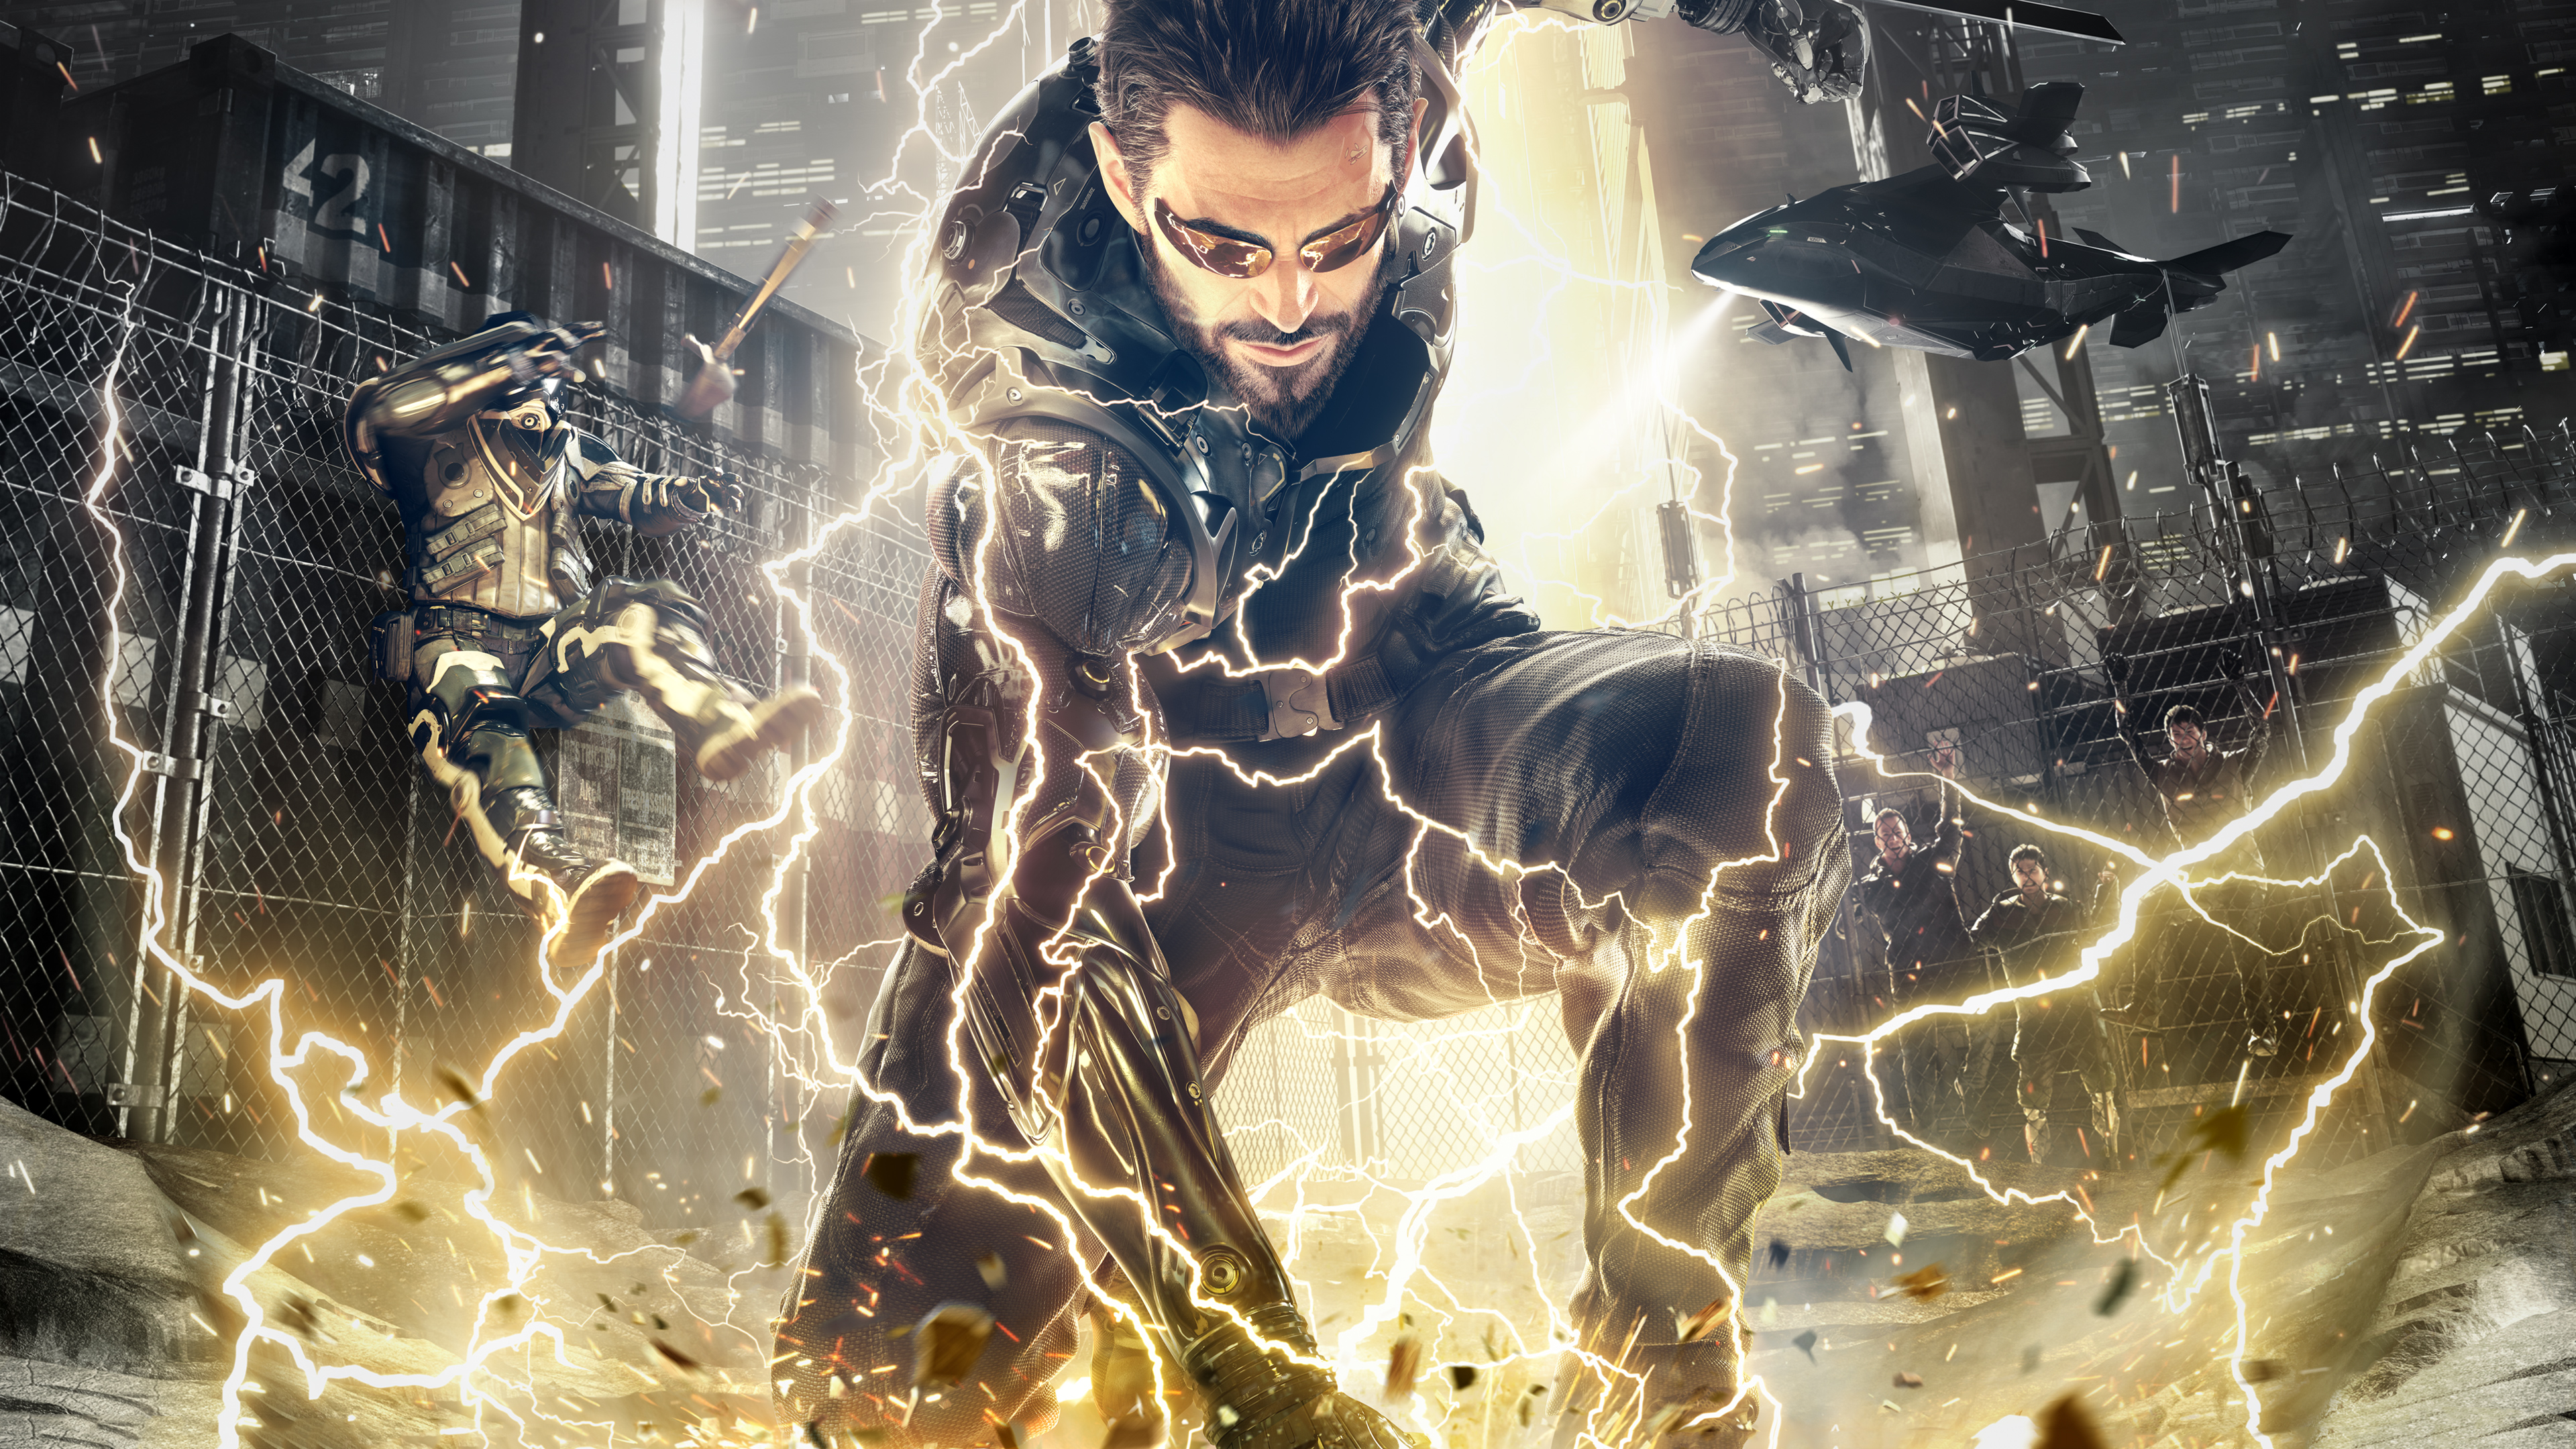 Deus Ex Mankind Divided 4k 2018 Hd Games 4k Wallpapers Images